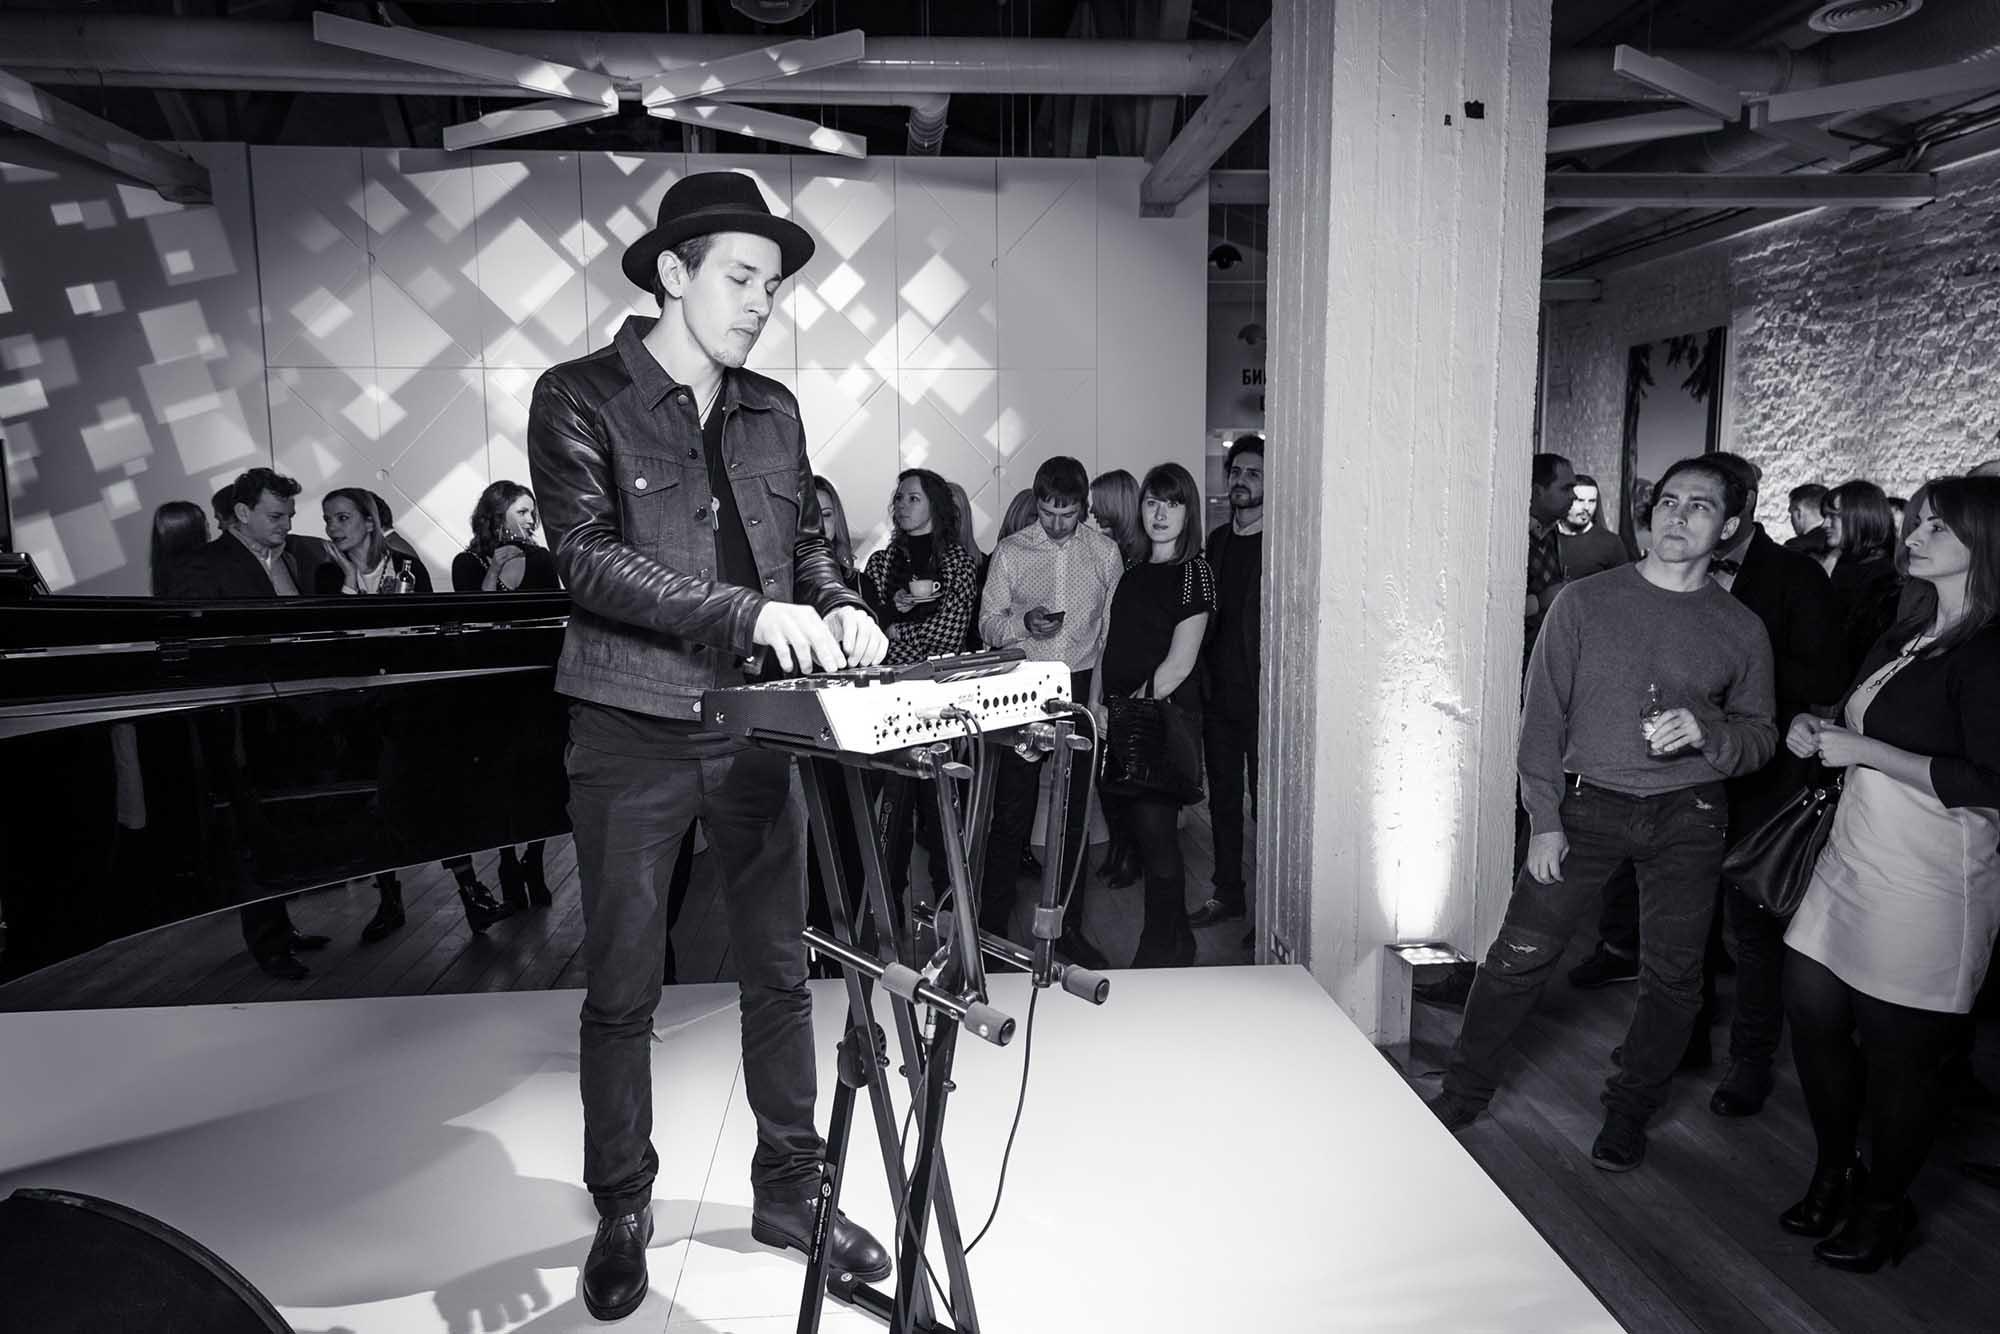 NICK4117_презентация_Event_yota_yotaphone_Urban_moscow